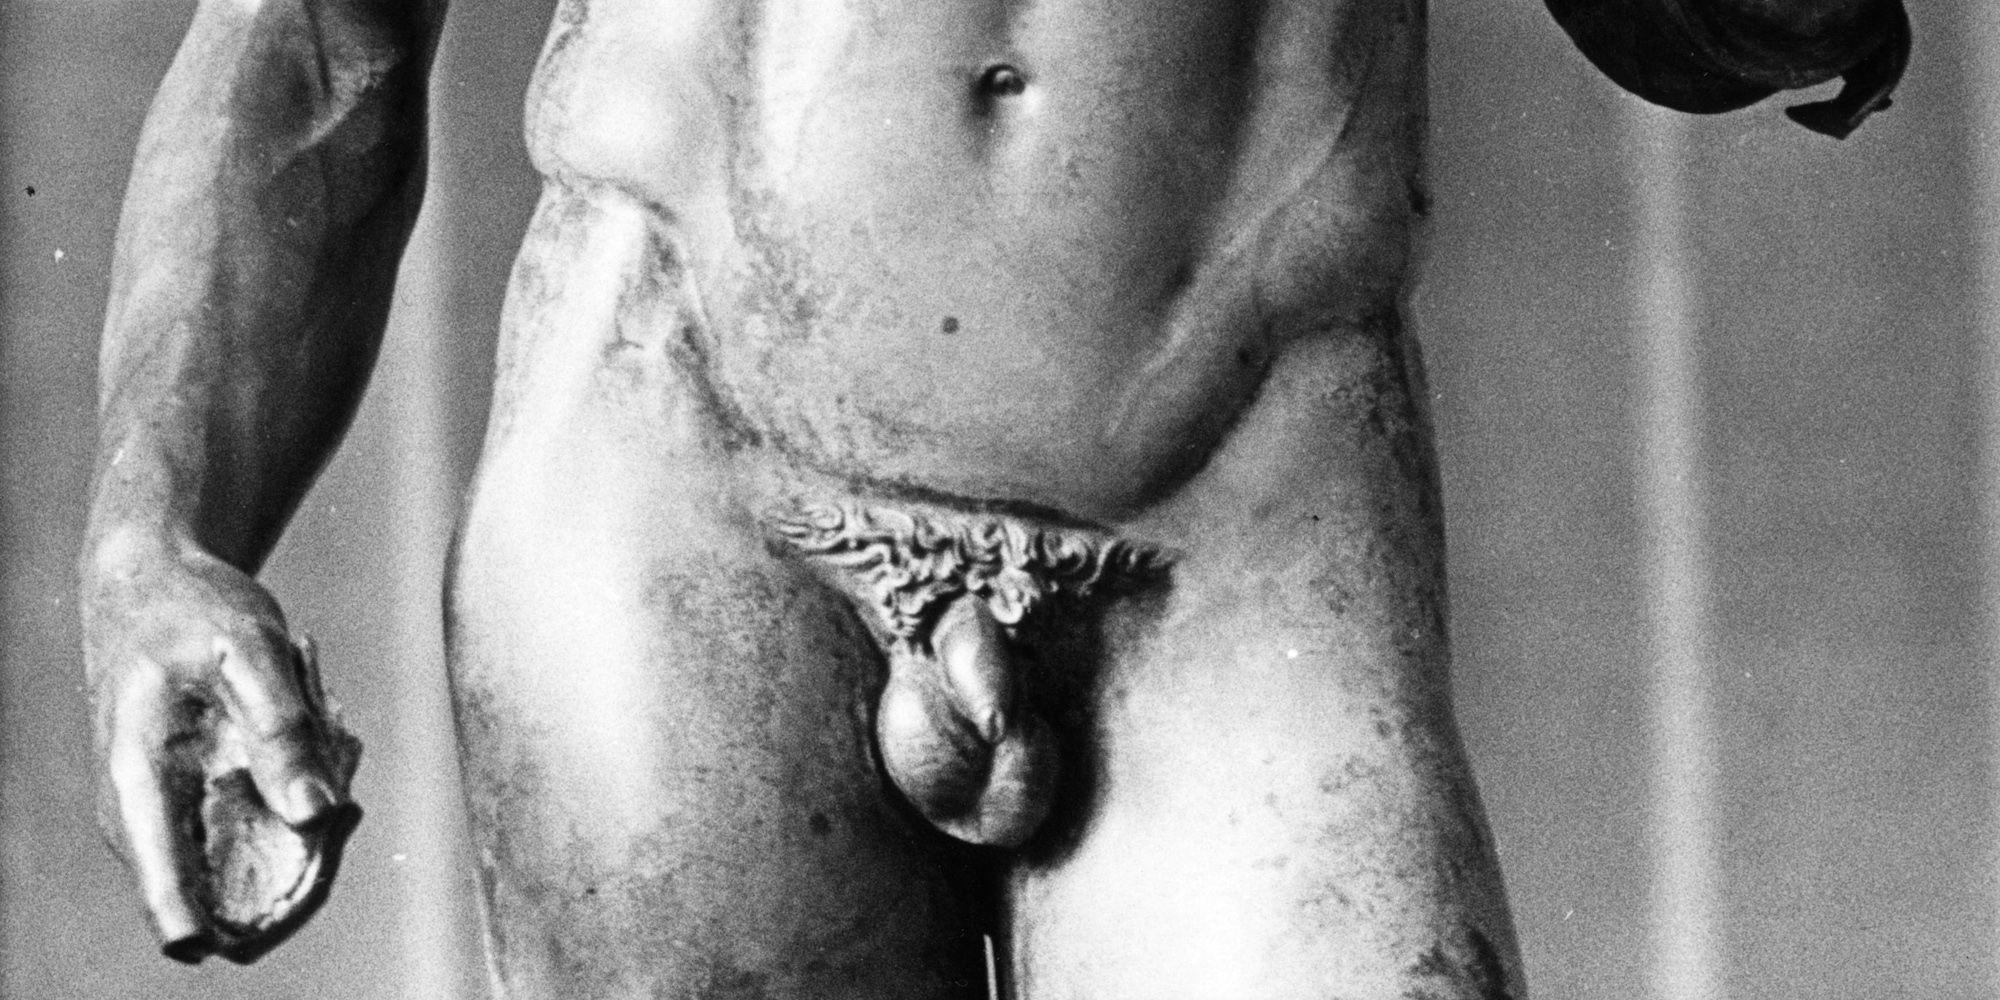 nude dicks painted like people penis people